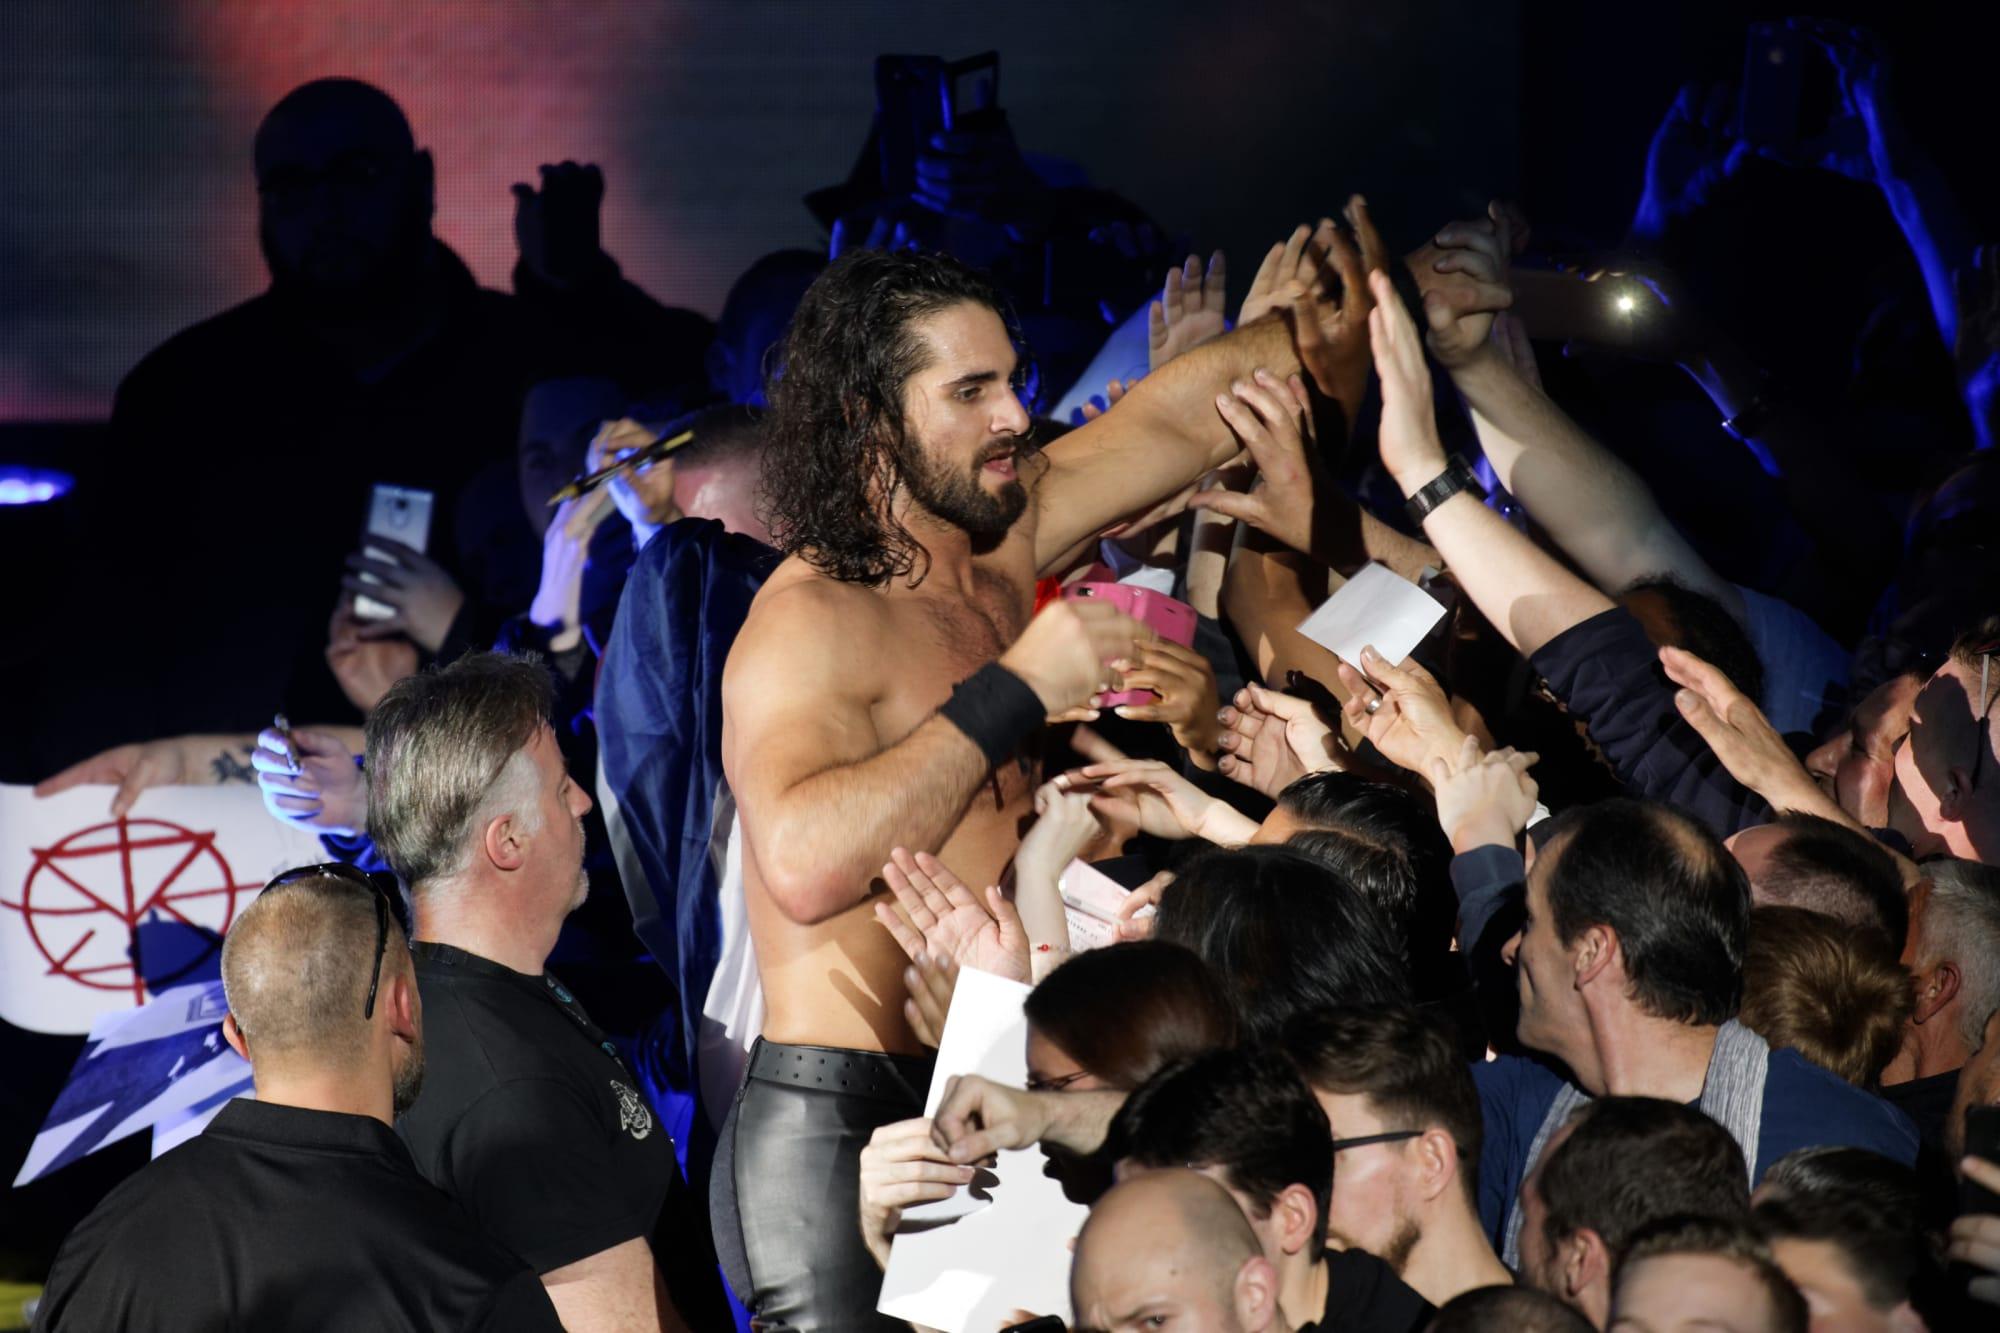 Seth Rollins has quite an impressive SummerSlam record